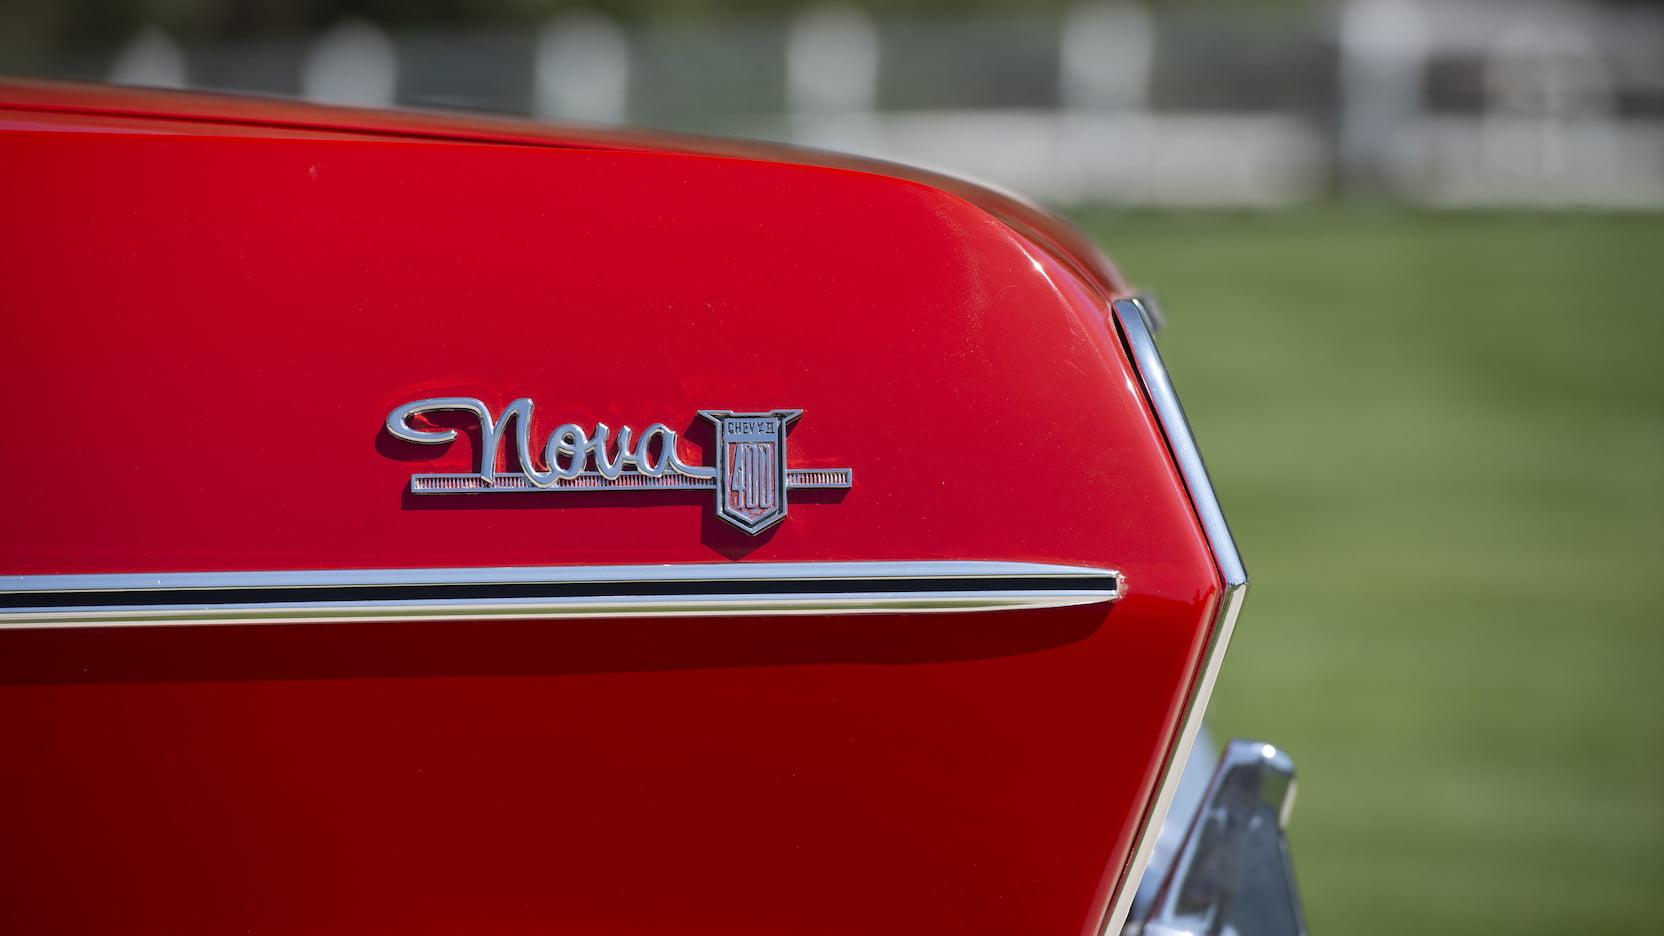 1962 Chevrolet Chevy II Nova 400 badge